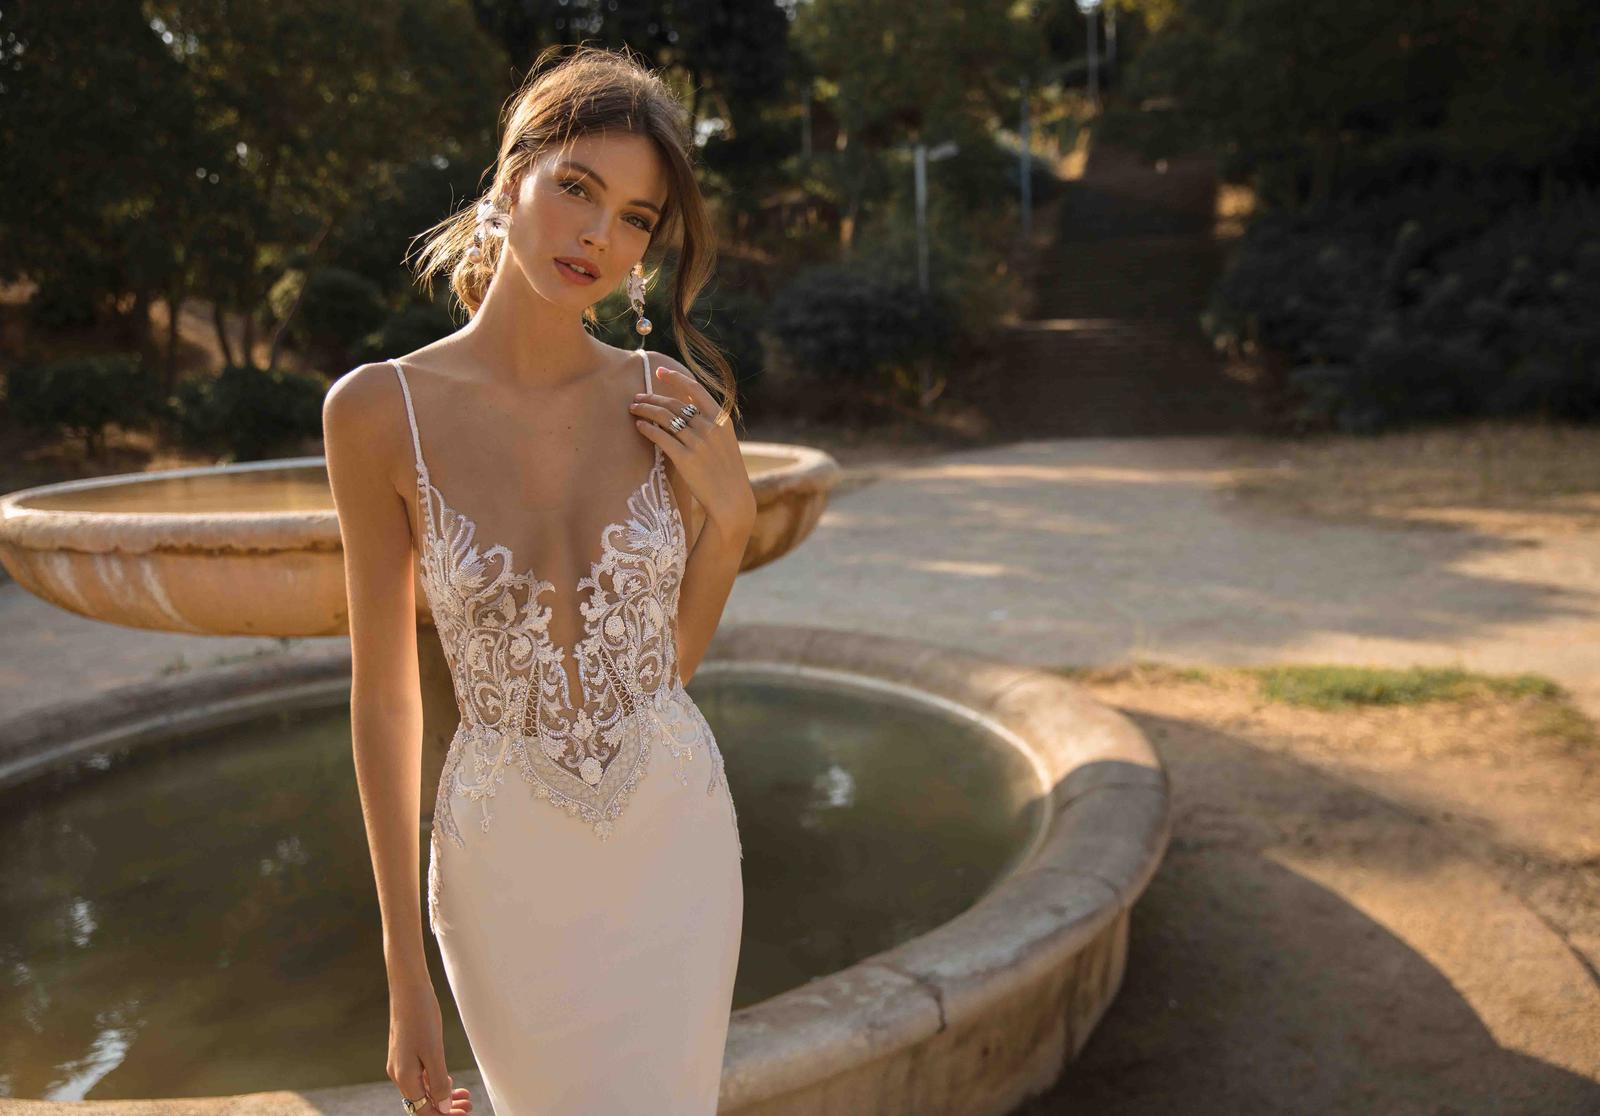 Muse by Berta * Svadobné šaty z kolekcií na rok 2019 - Obrázok č. 13